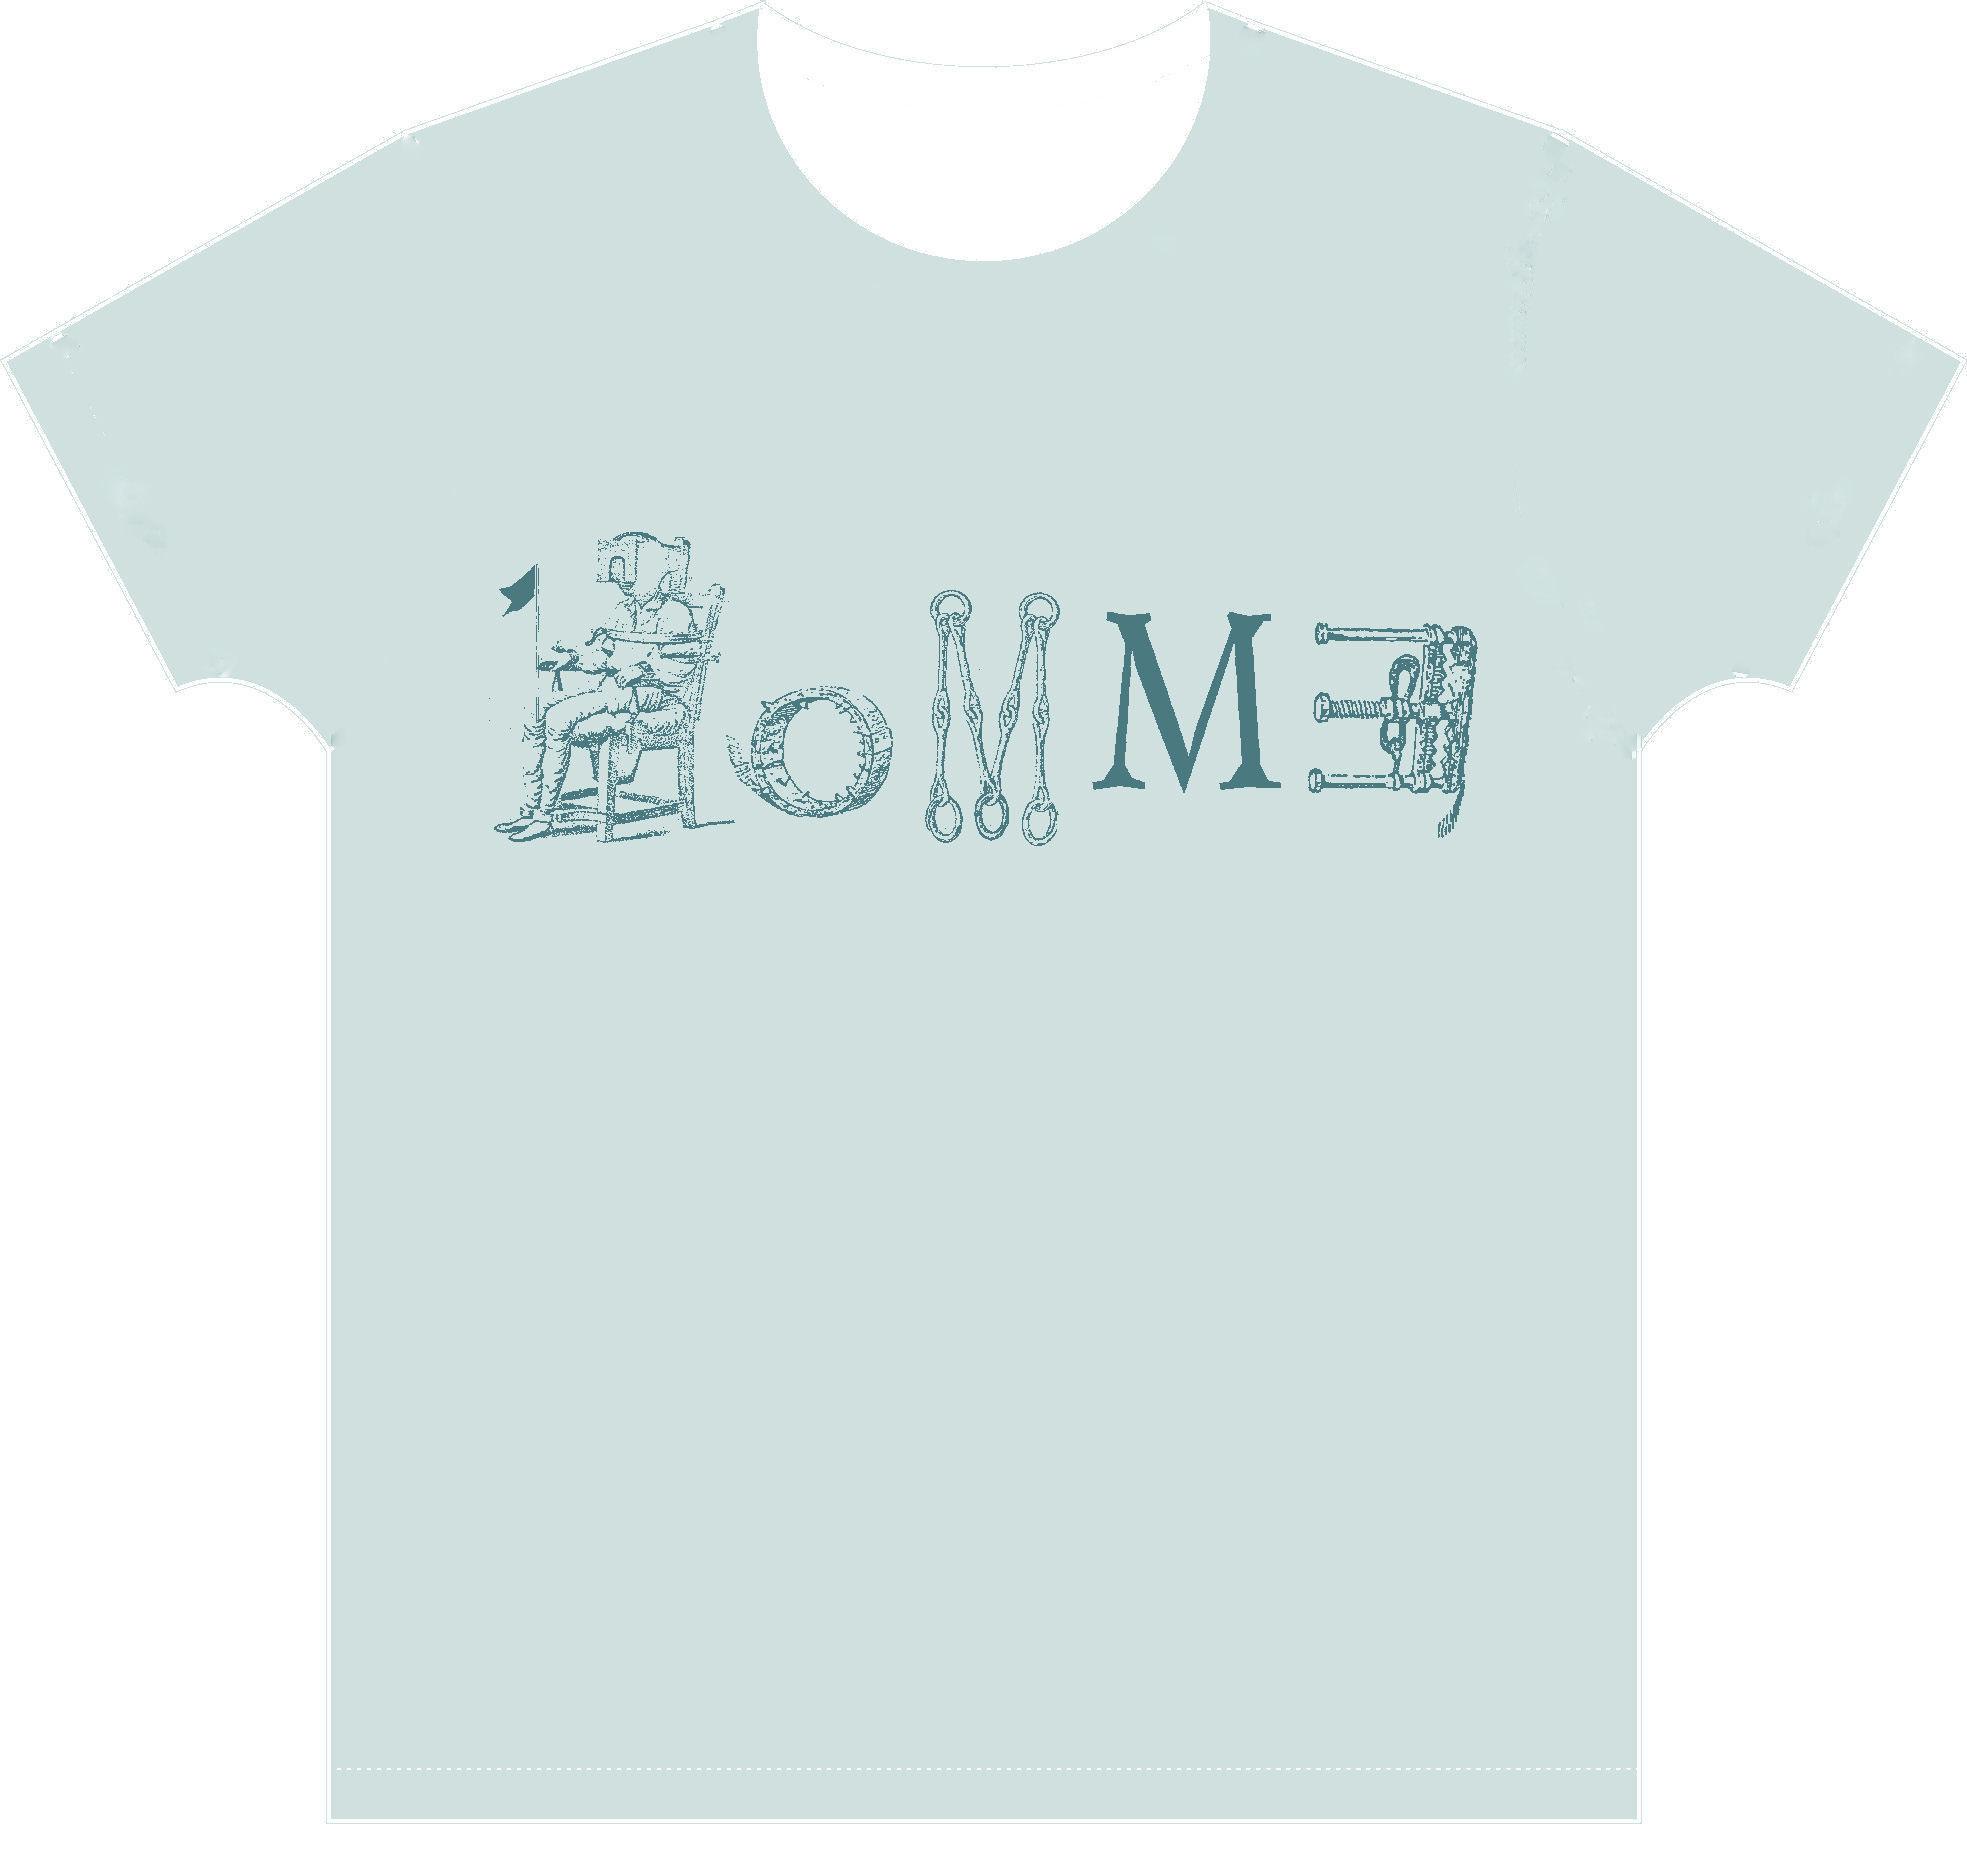 HOMMヨ Tシャツ シャーベットブルー(限定)